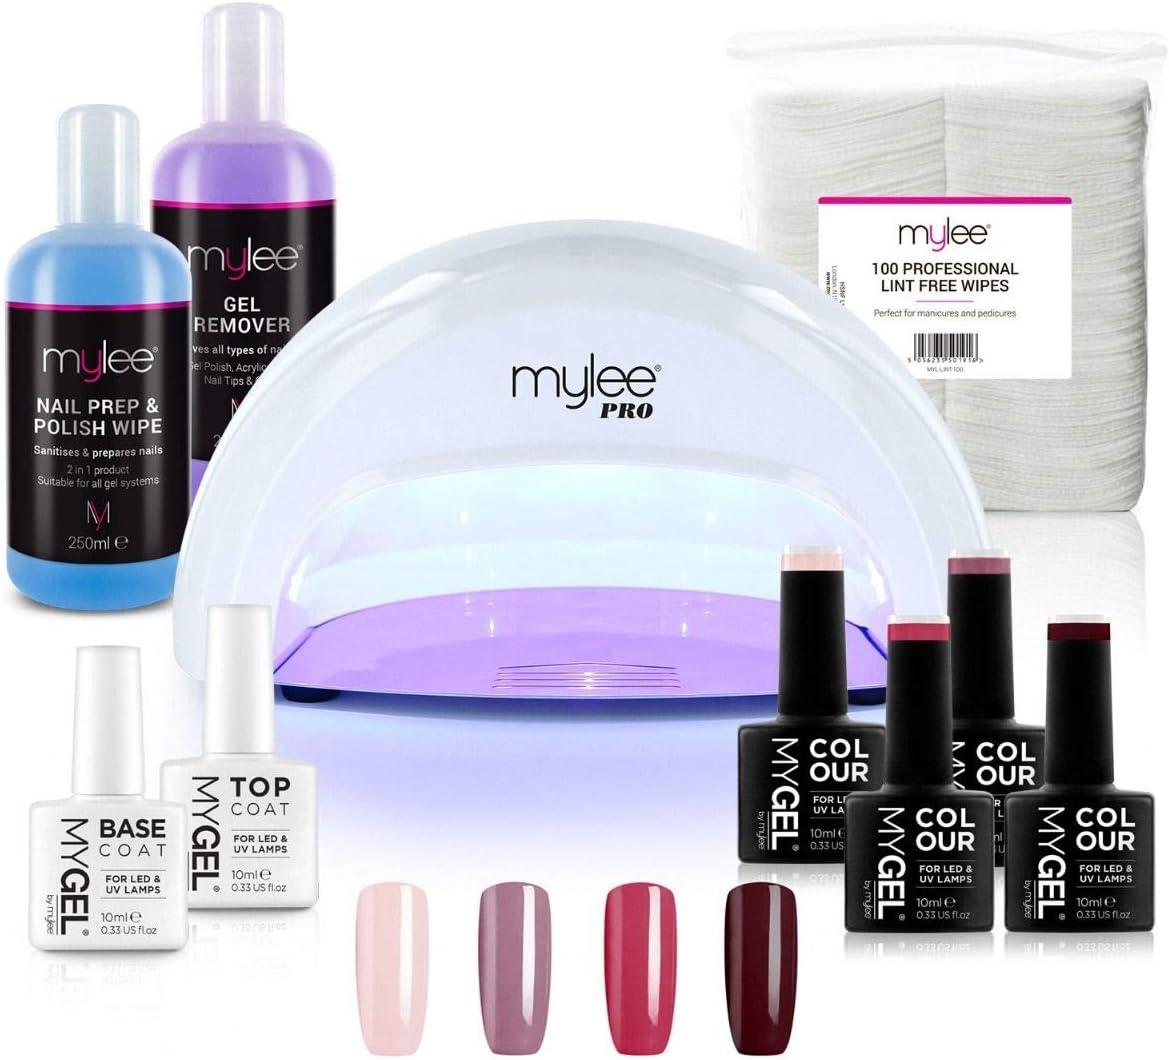 Kit Profesional LED Mylee para barniz de uñas, 4x colores MYGEL, capa superior e inferior, lámpara LED de curado convexo Mylee PRO Series, Prep & Wipe, removedor de gel (Blanco)